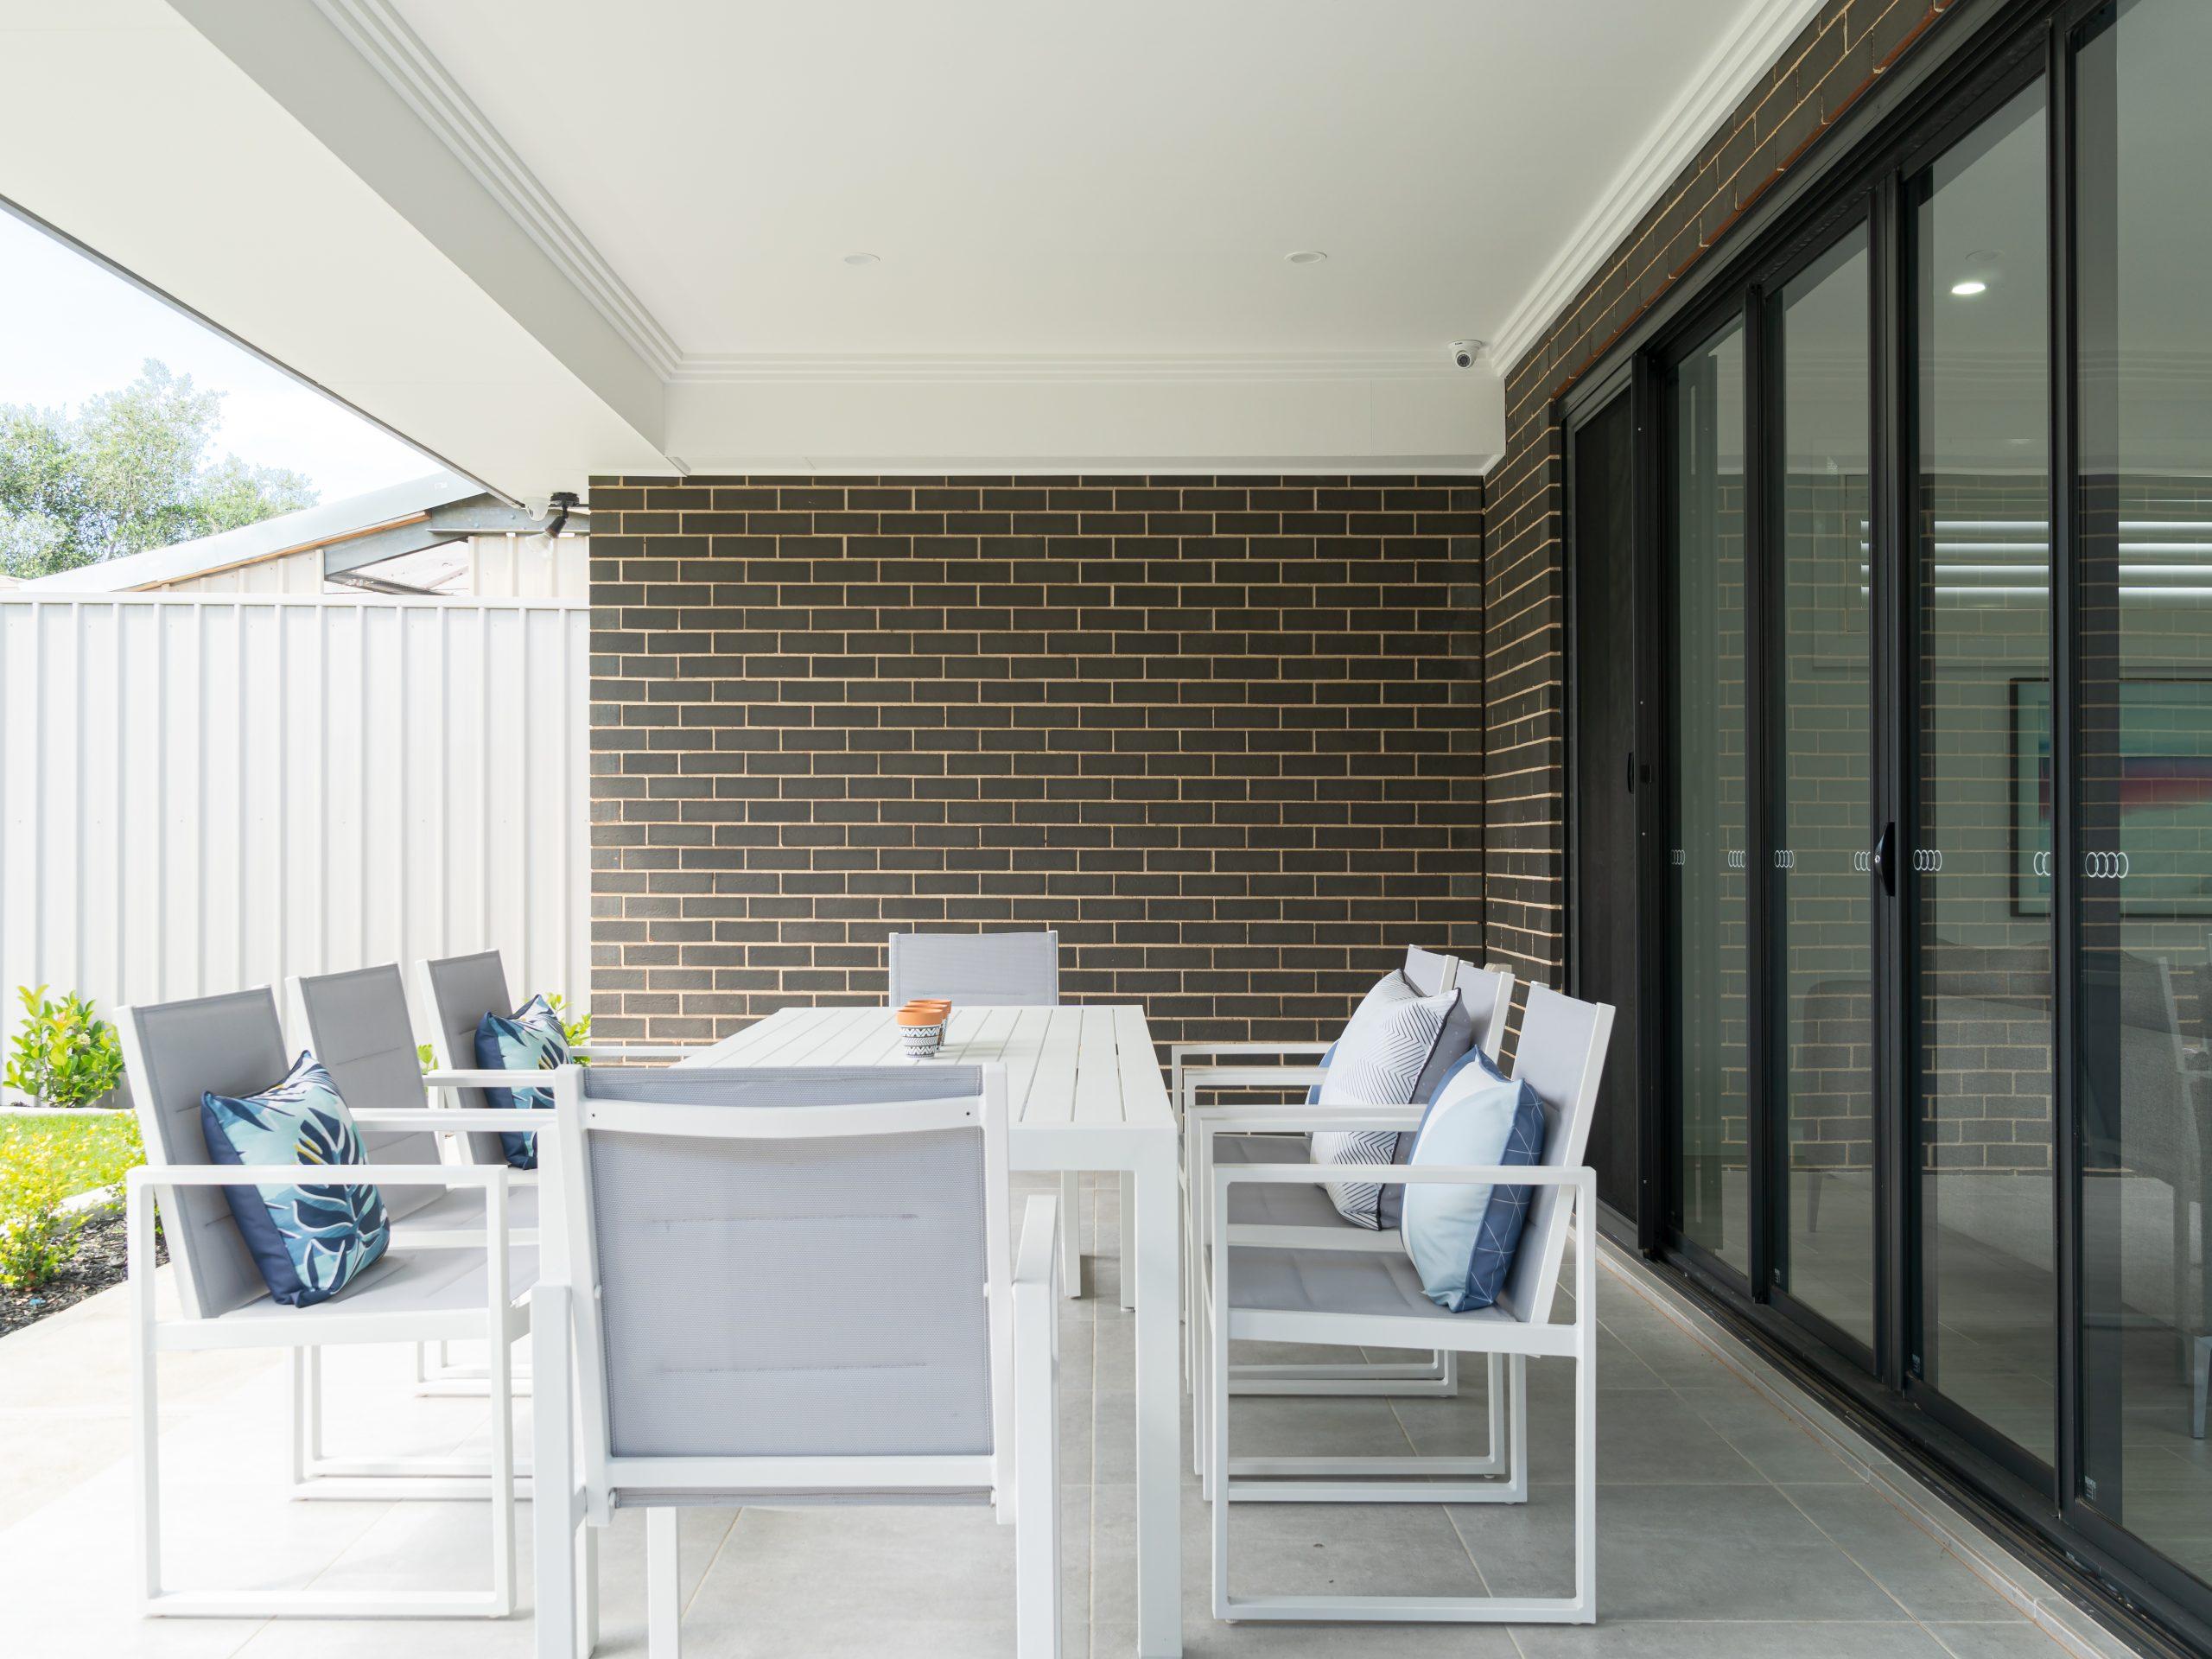 Kidman Park - Kidman - HBC Homes Adelaide - _DSC1174-Edit